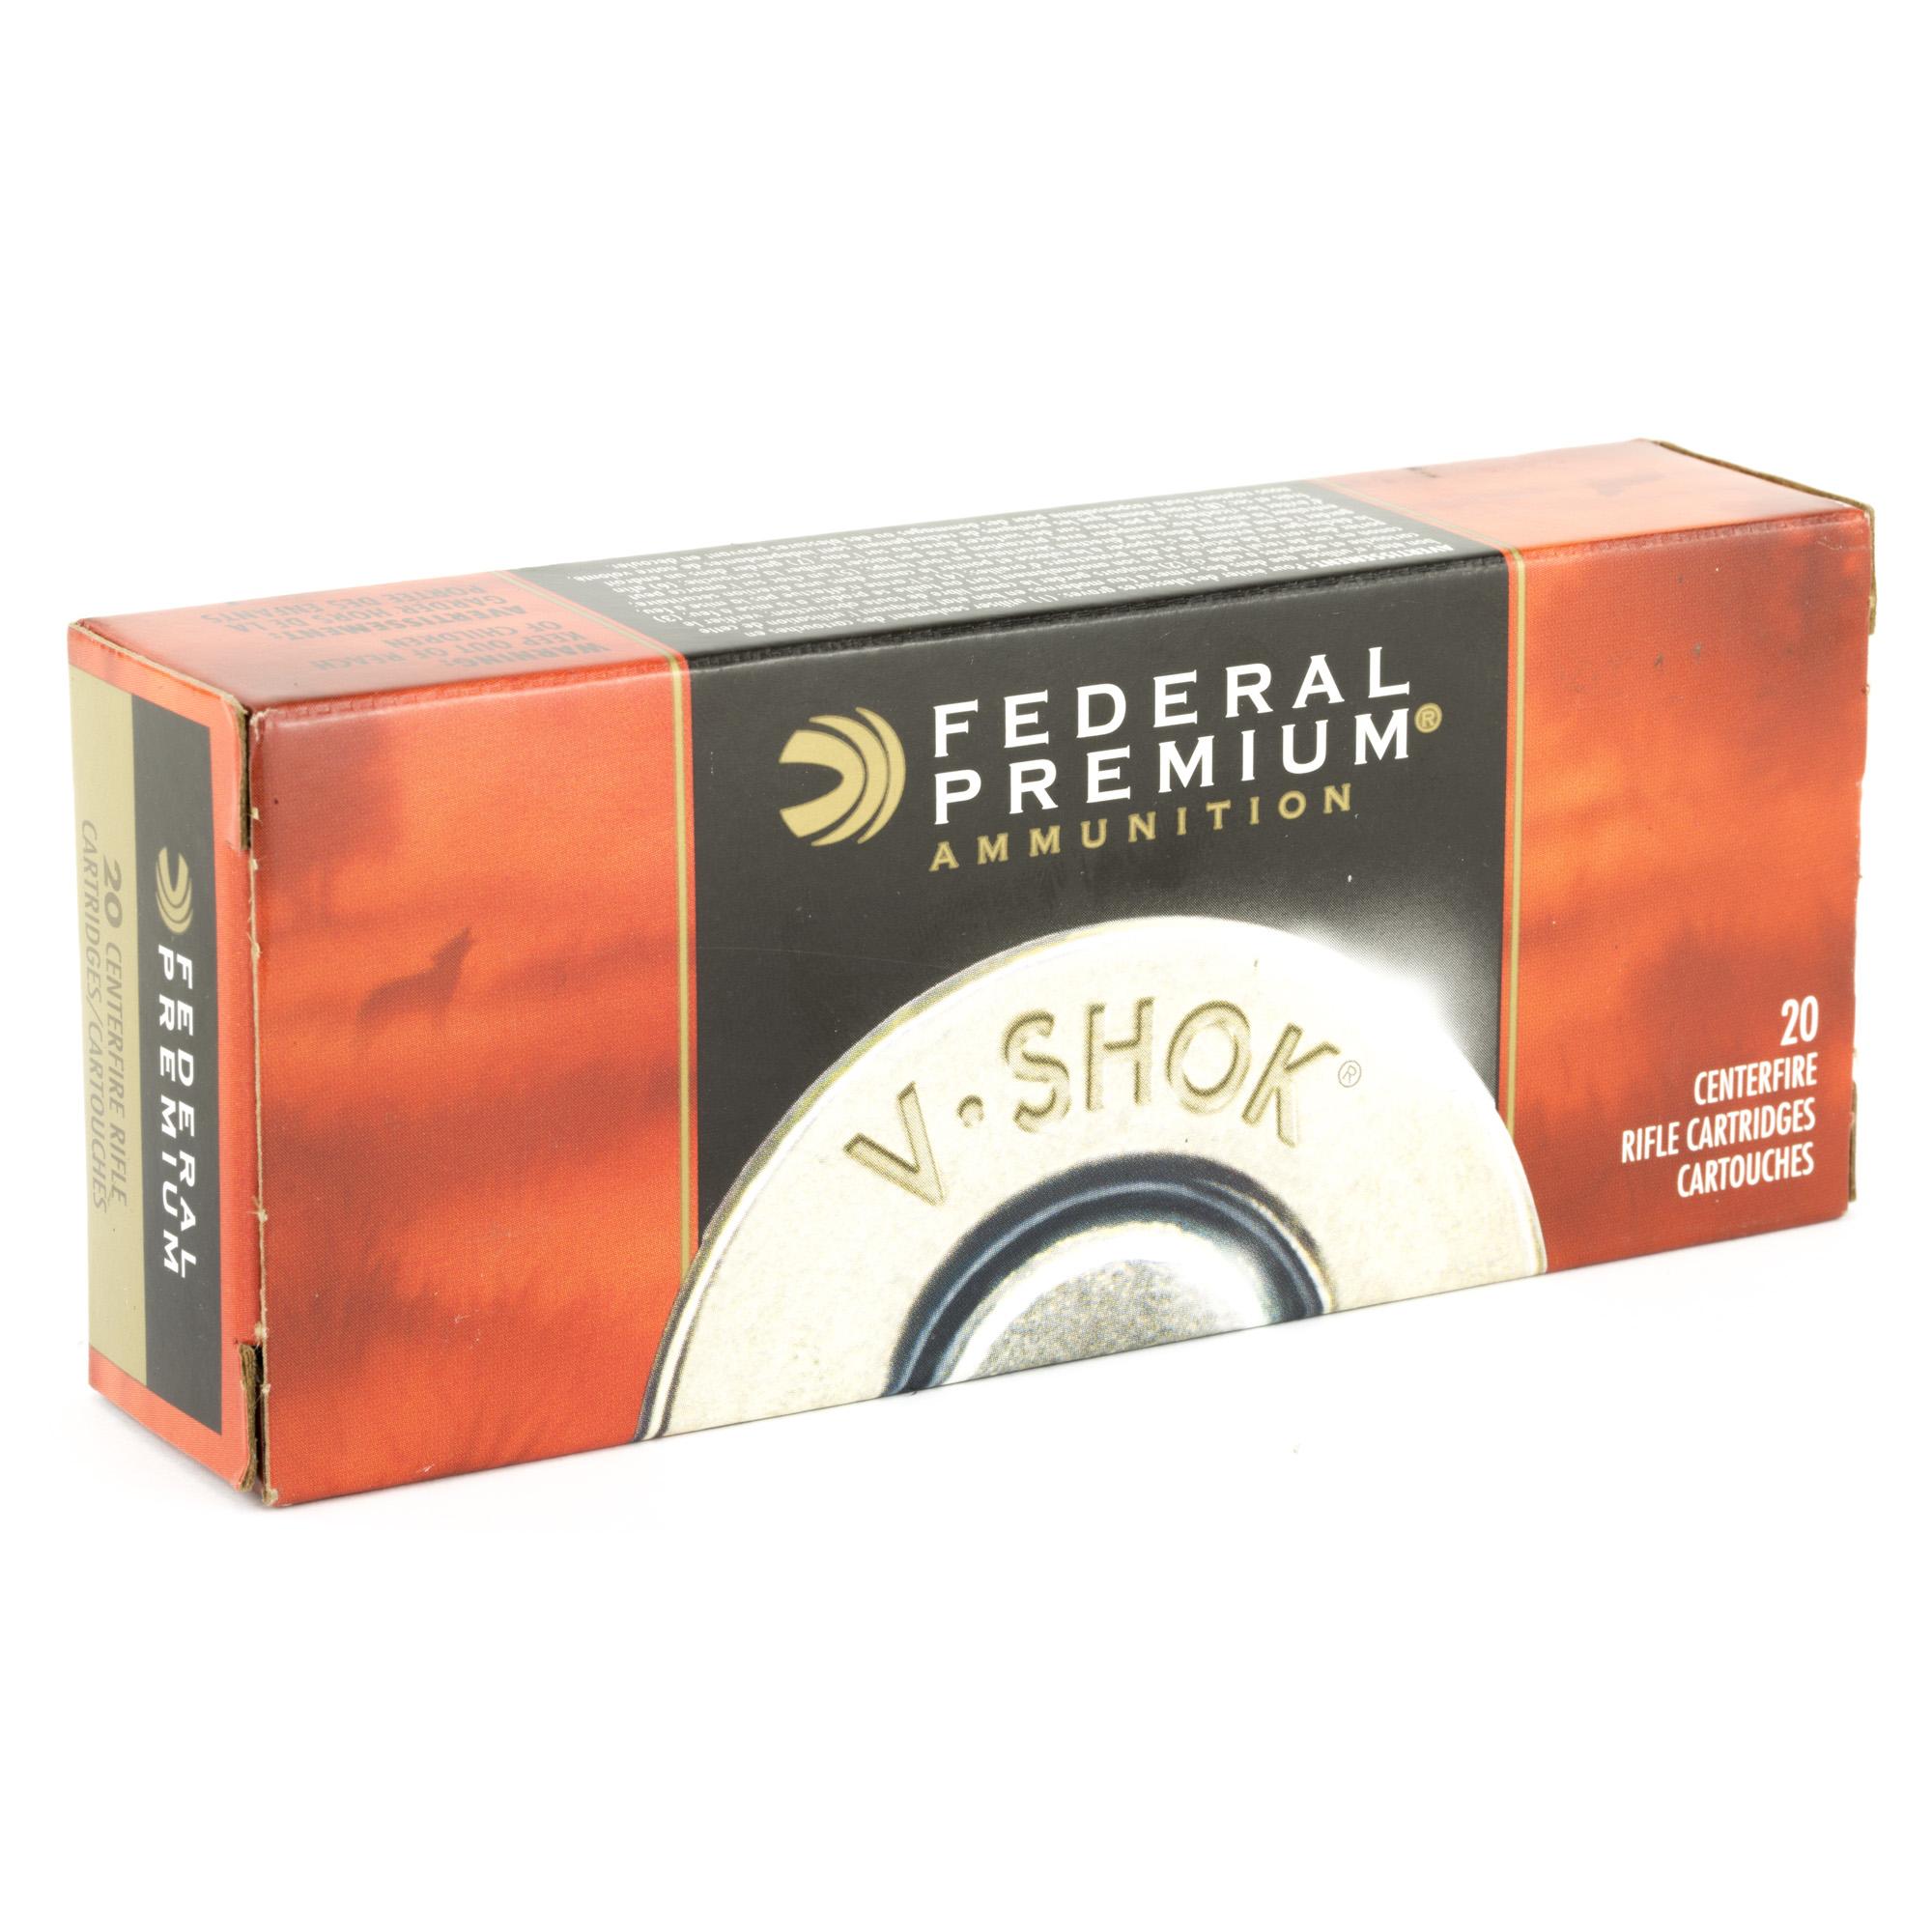 Federal Premium 223 Remington 43gr V-Shock Speer TNT Green 20 Round Box